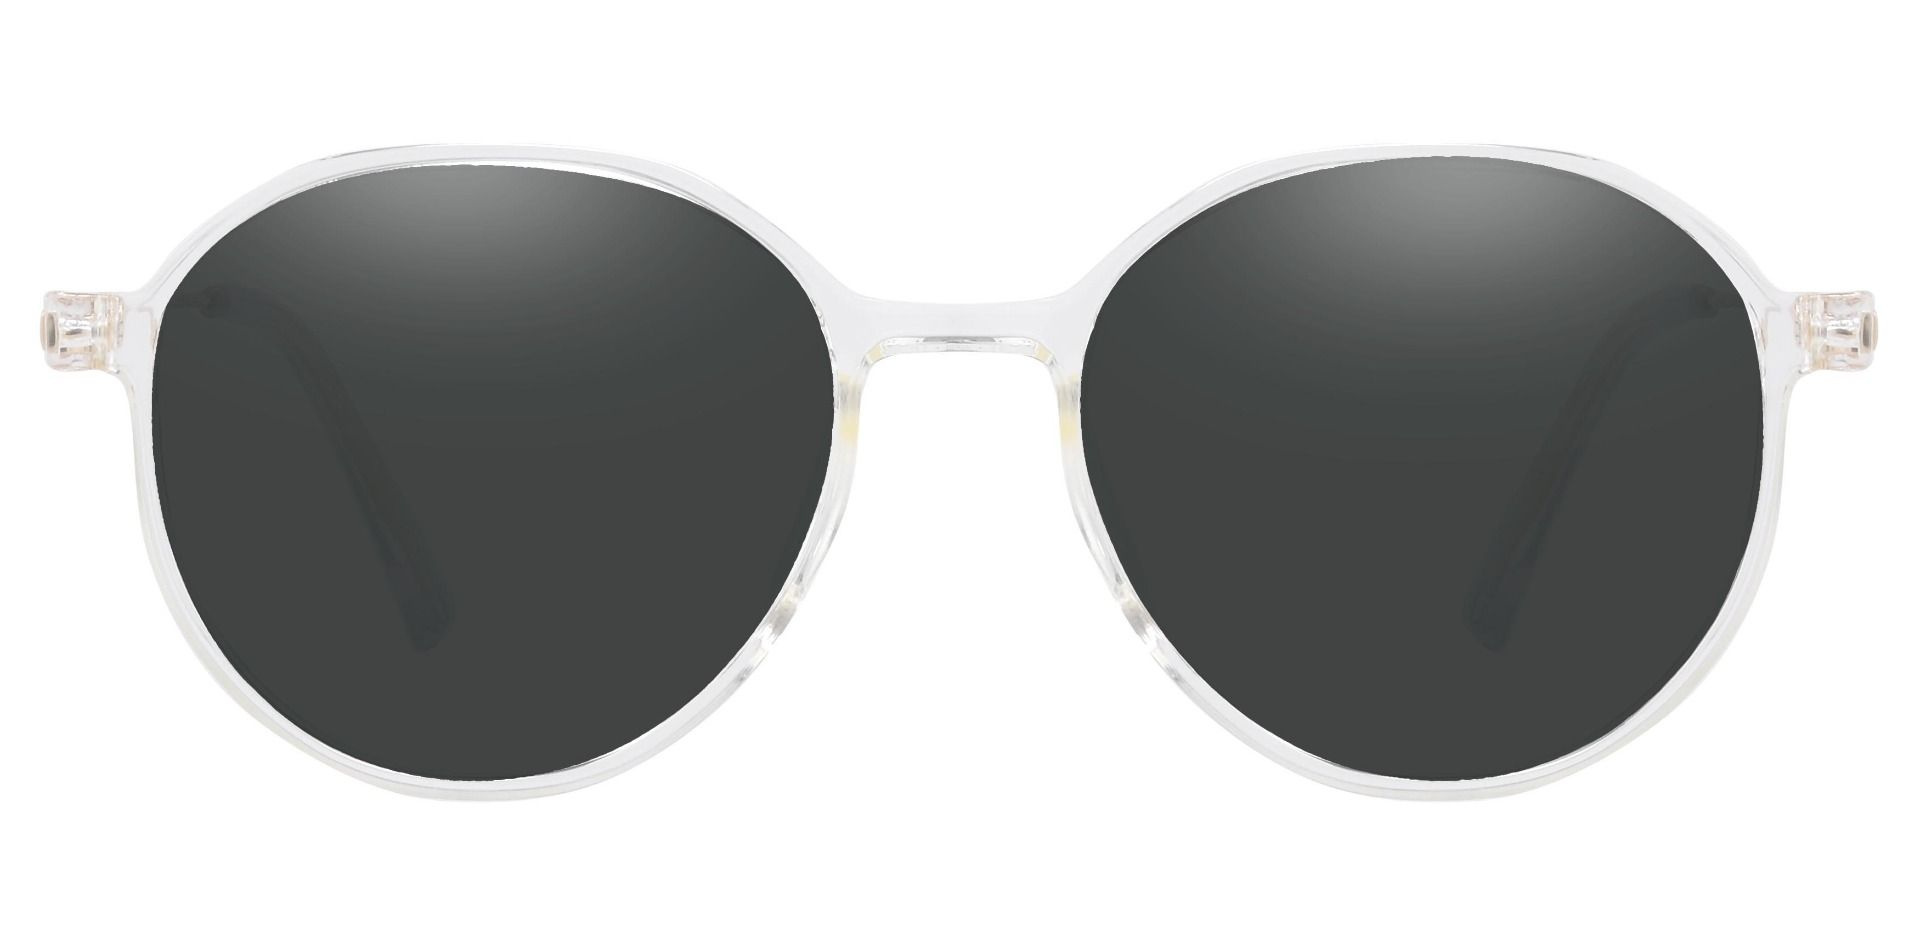 Daytona Geometric Prescription Sunglasses - Clear Frame With Gray Lenses